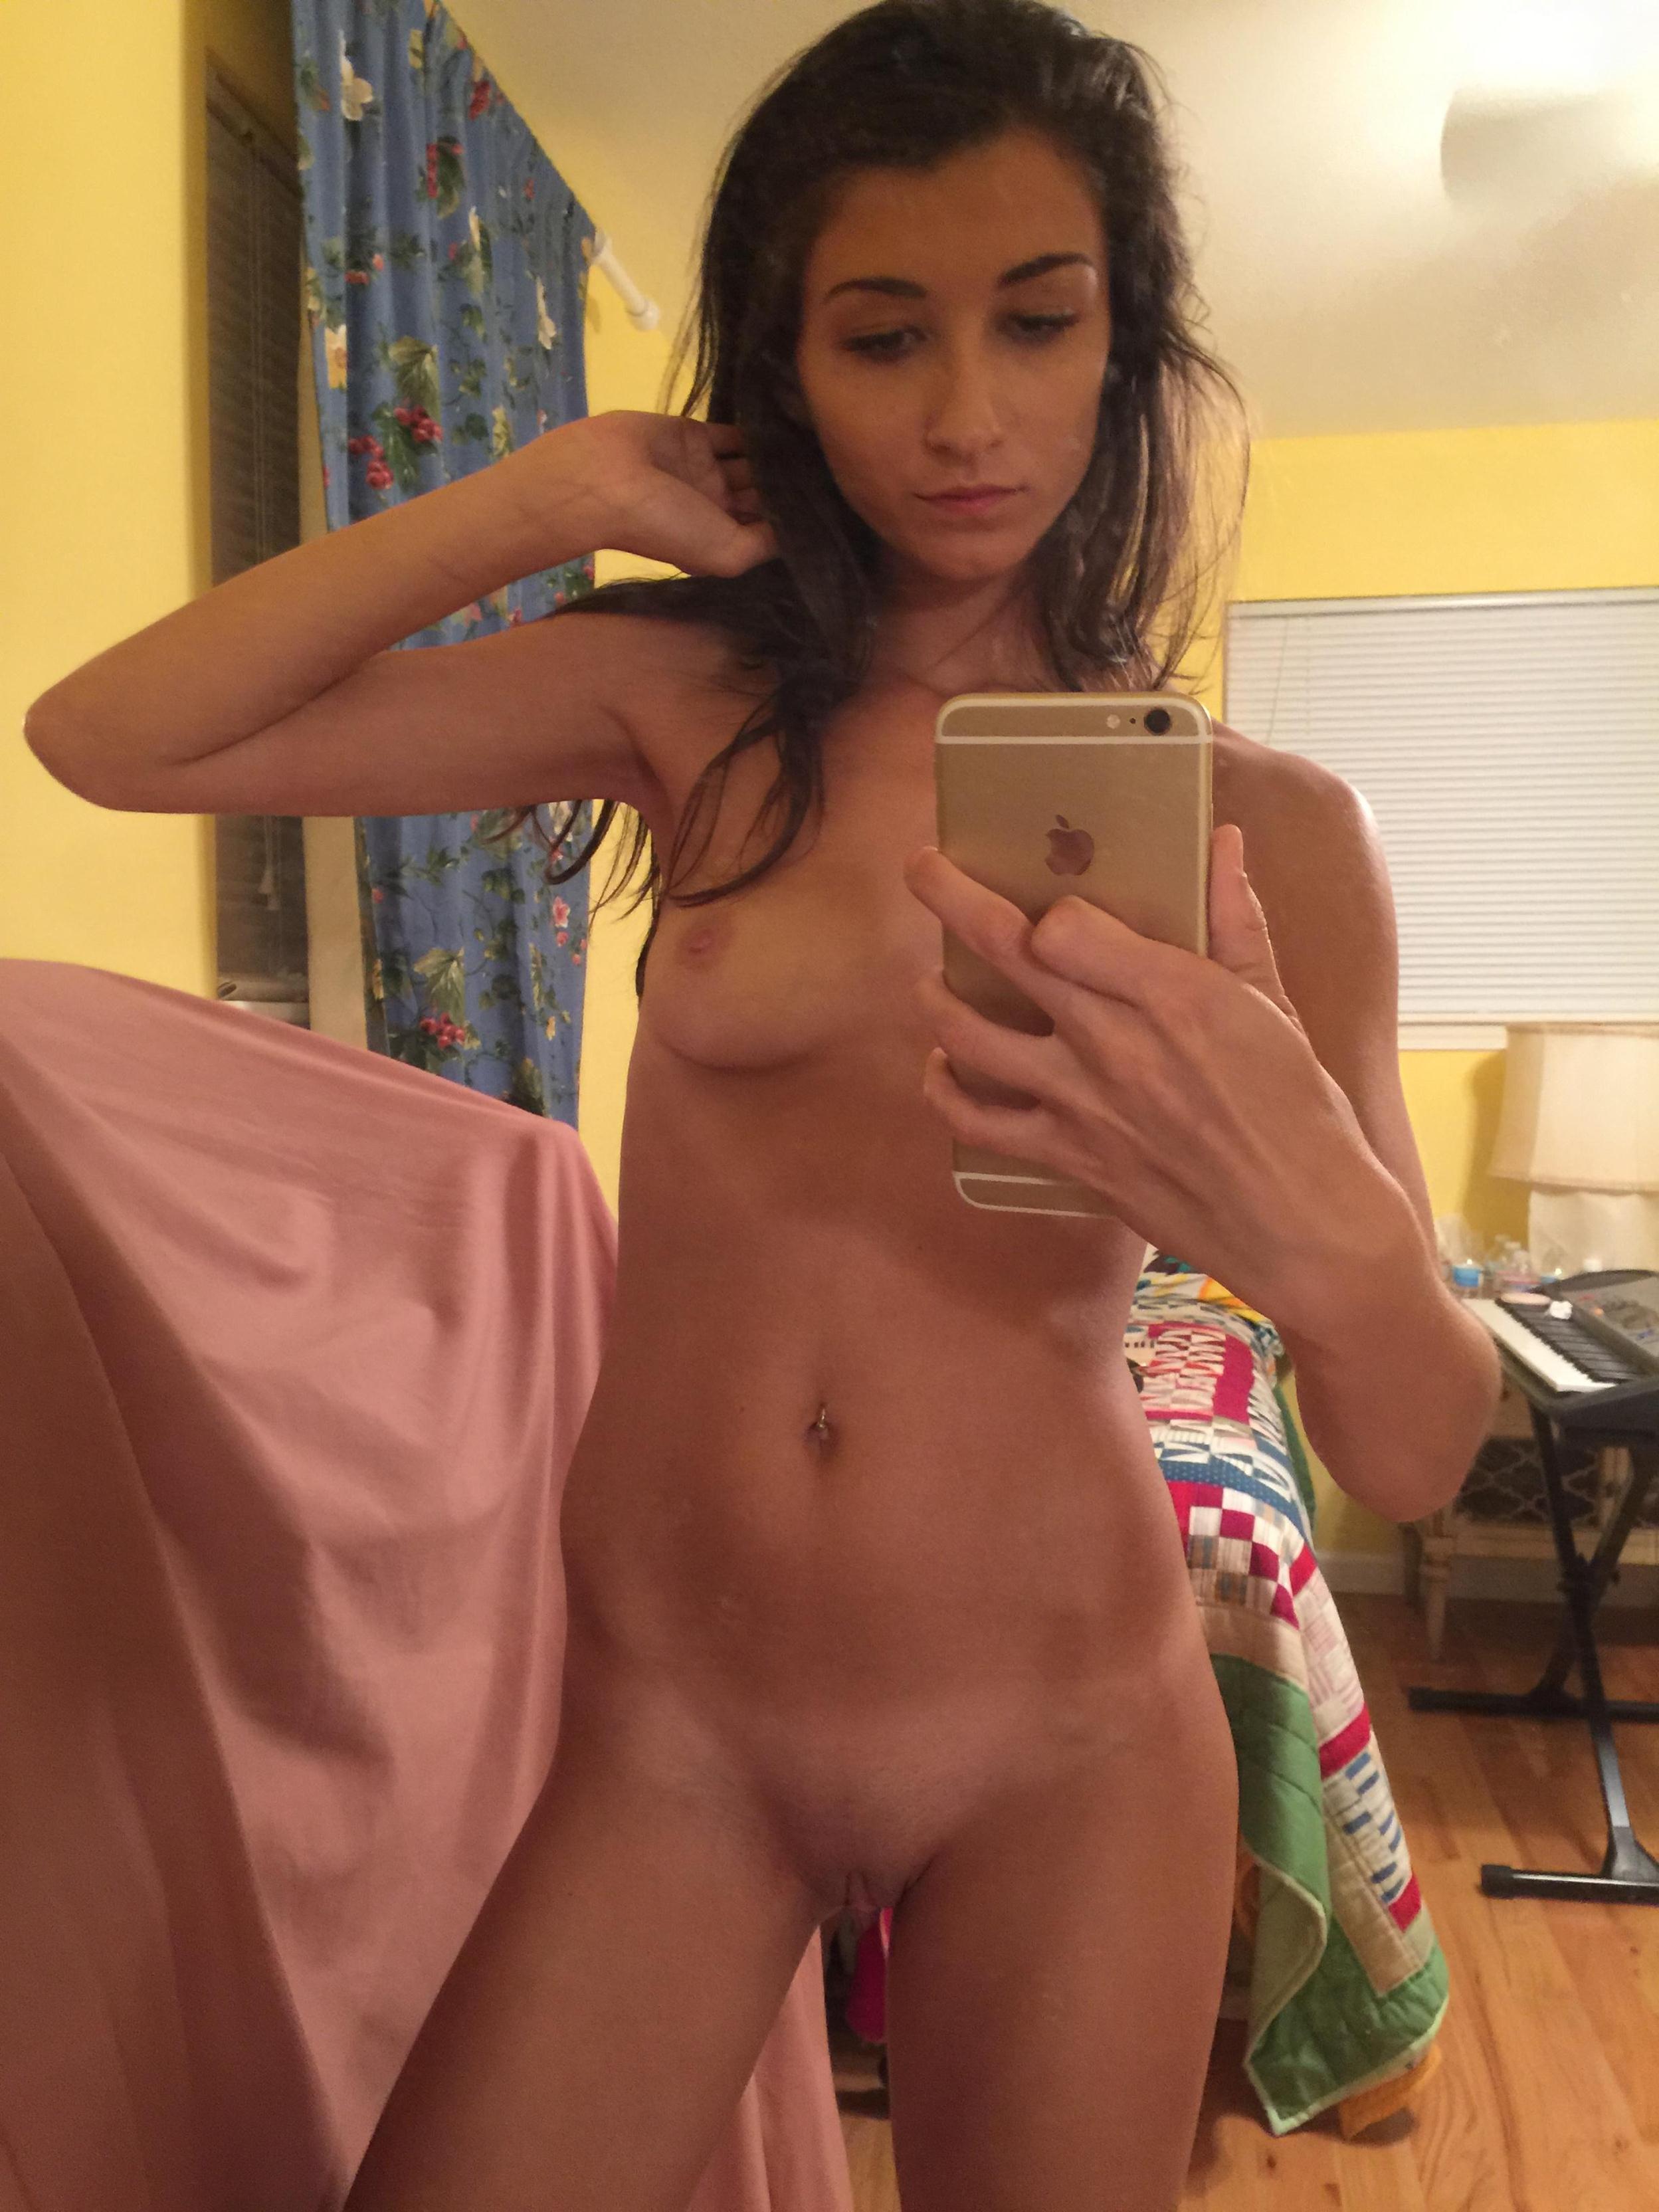 slim-body-amateur-girl-selfie-pics-mirror-nude-10